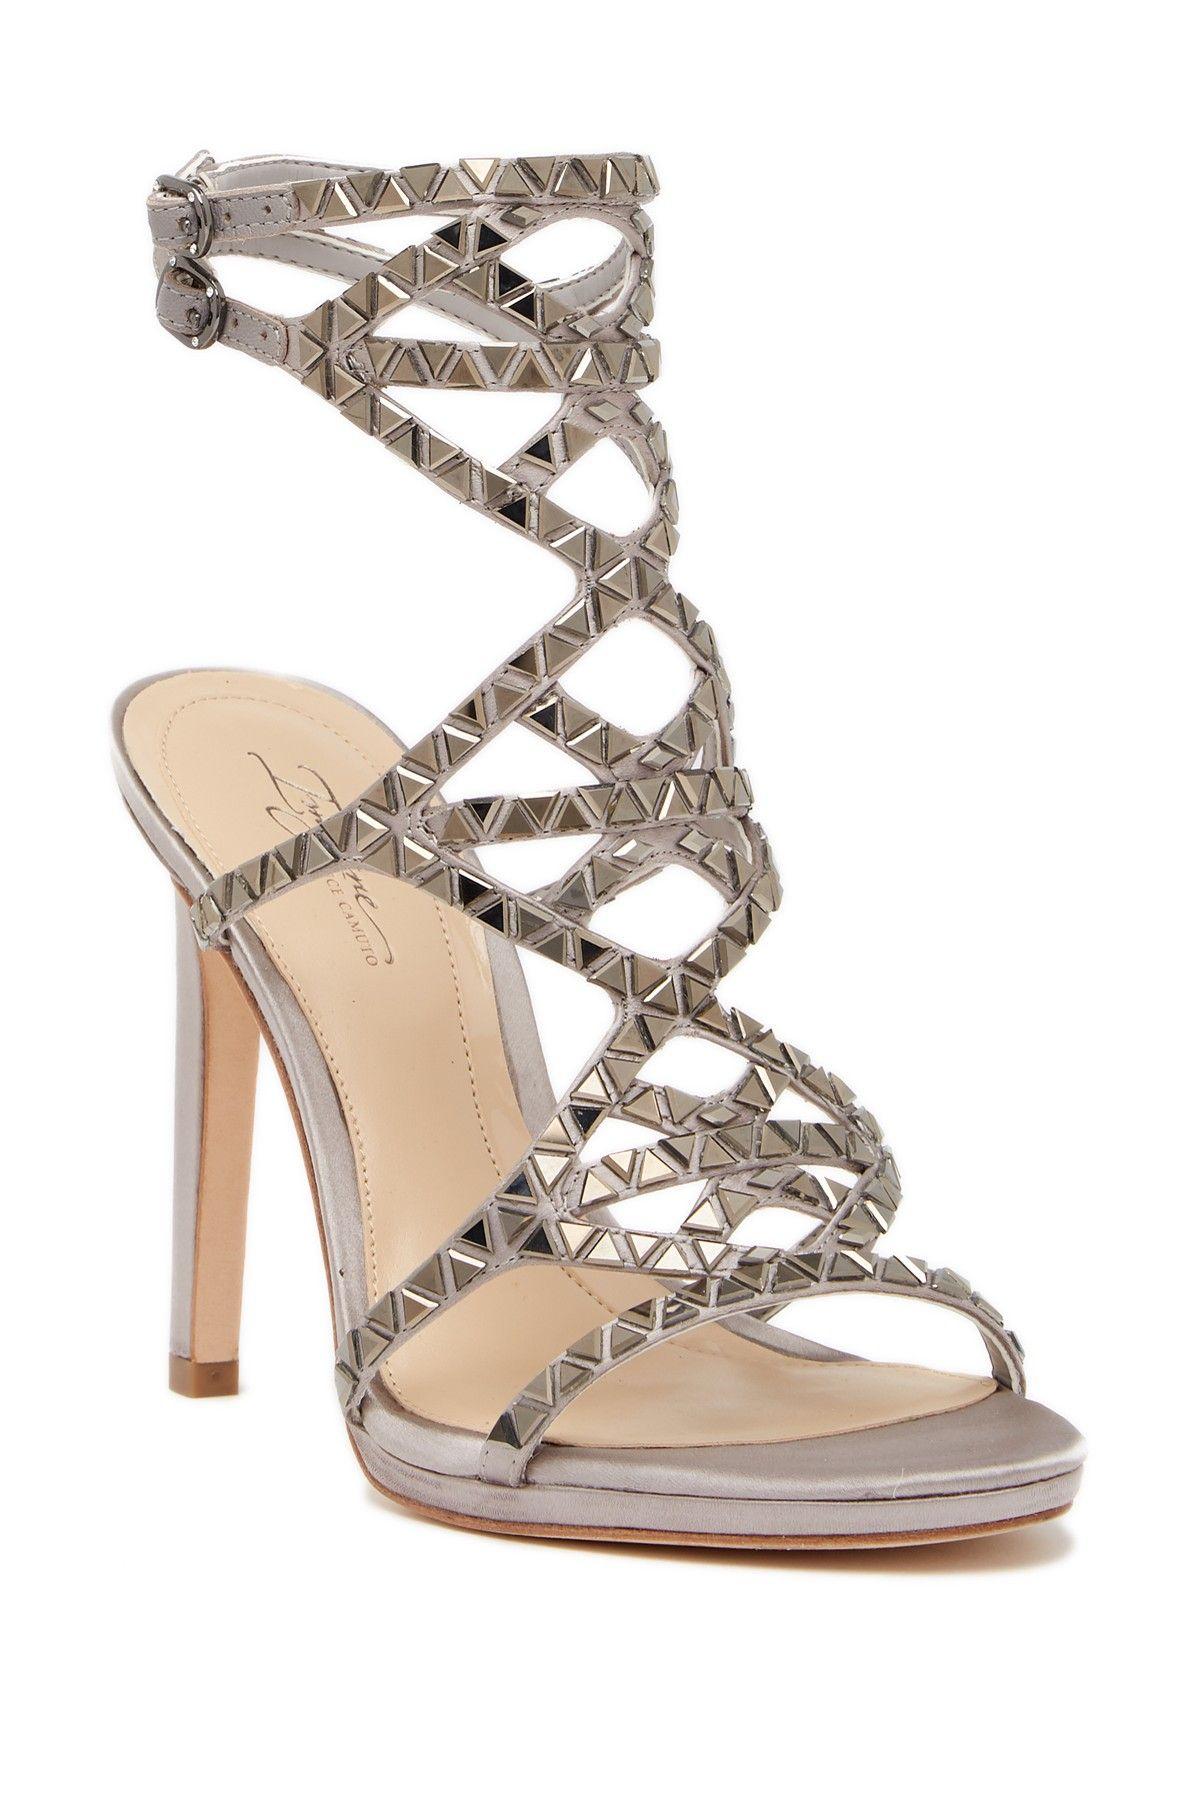 37e8d5c9108 Galvin Hi Heel Sandal Footwear